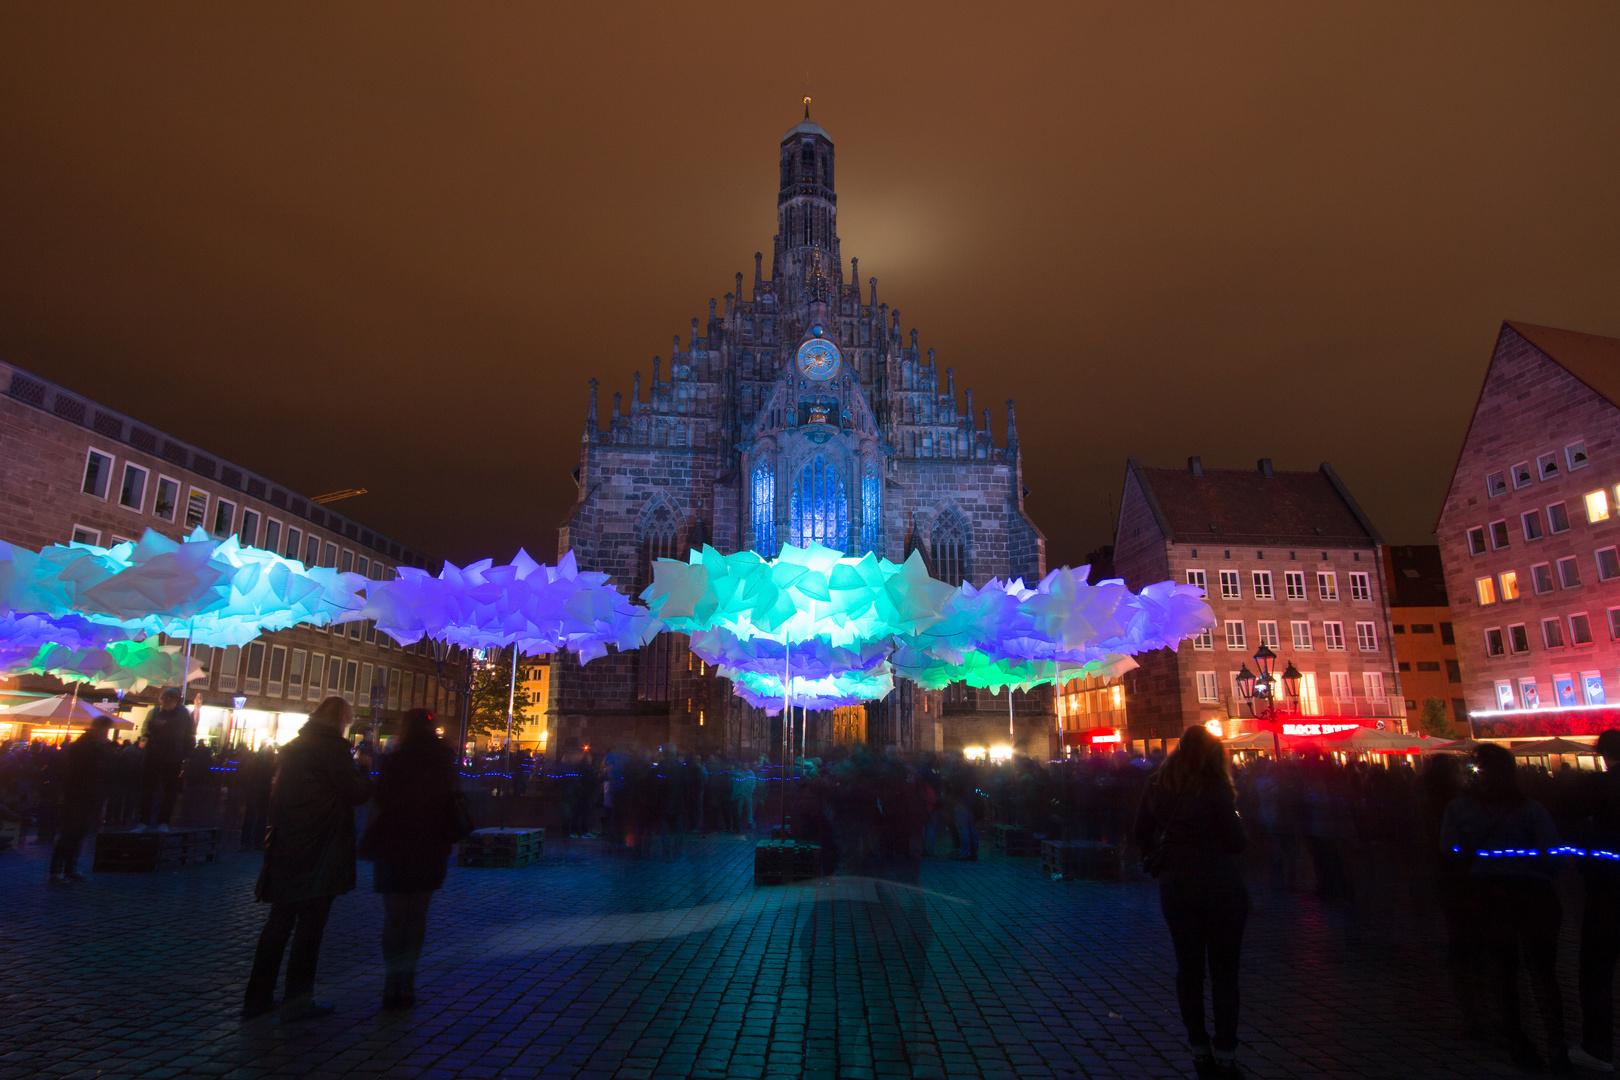 Blaue Nacht in Nürnberg 2014_2